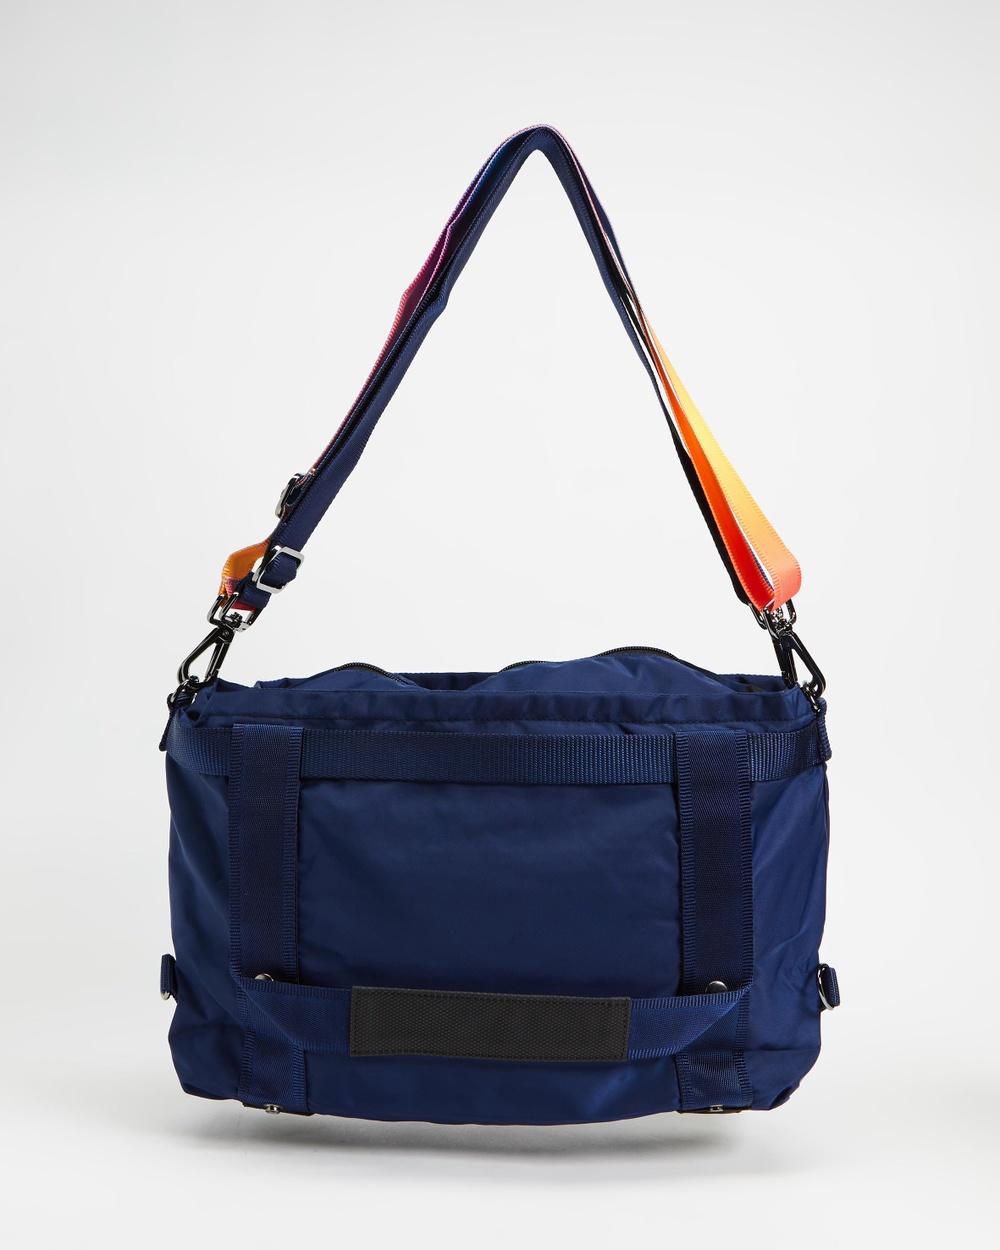 ANDI New York The Small Handbags Navy